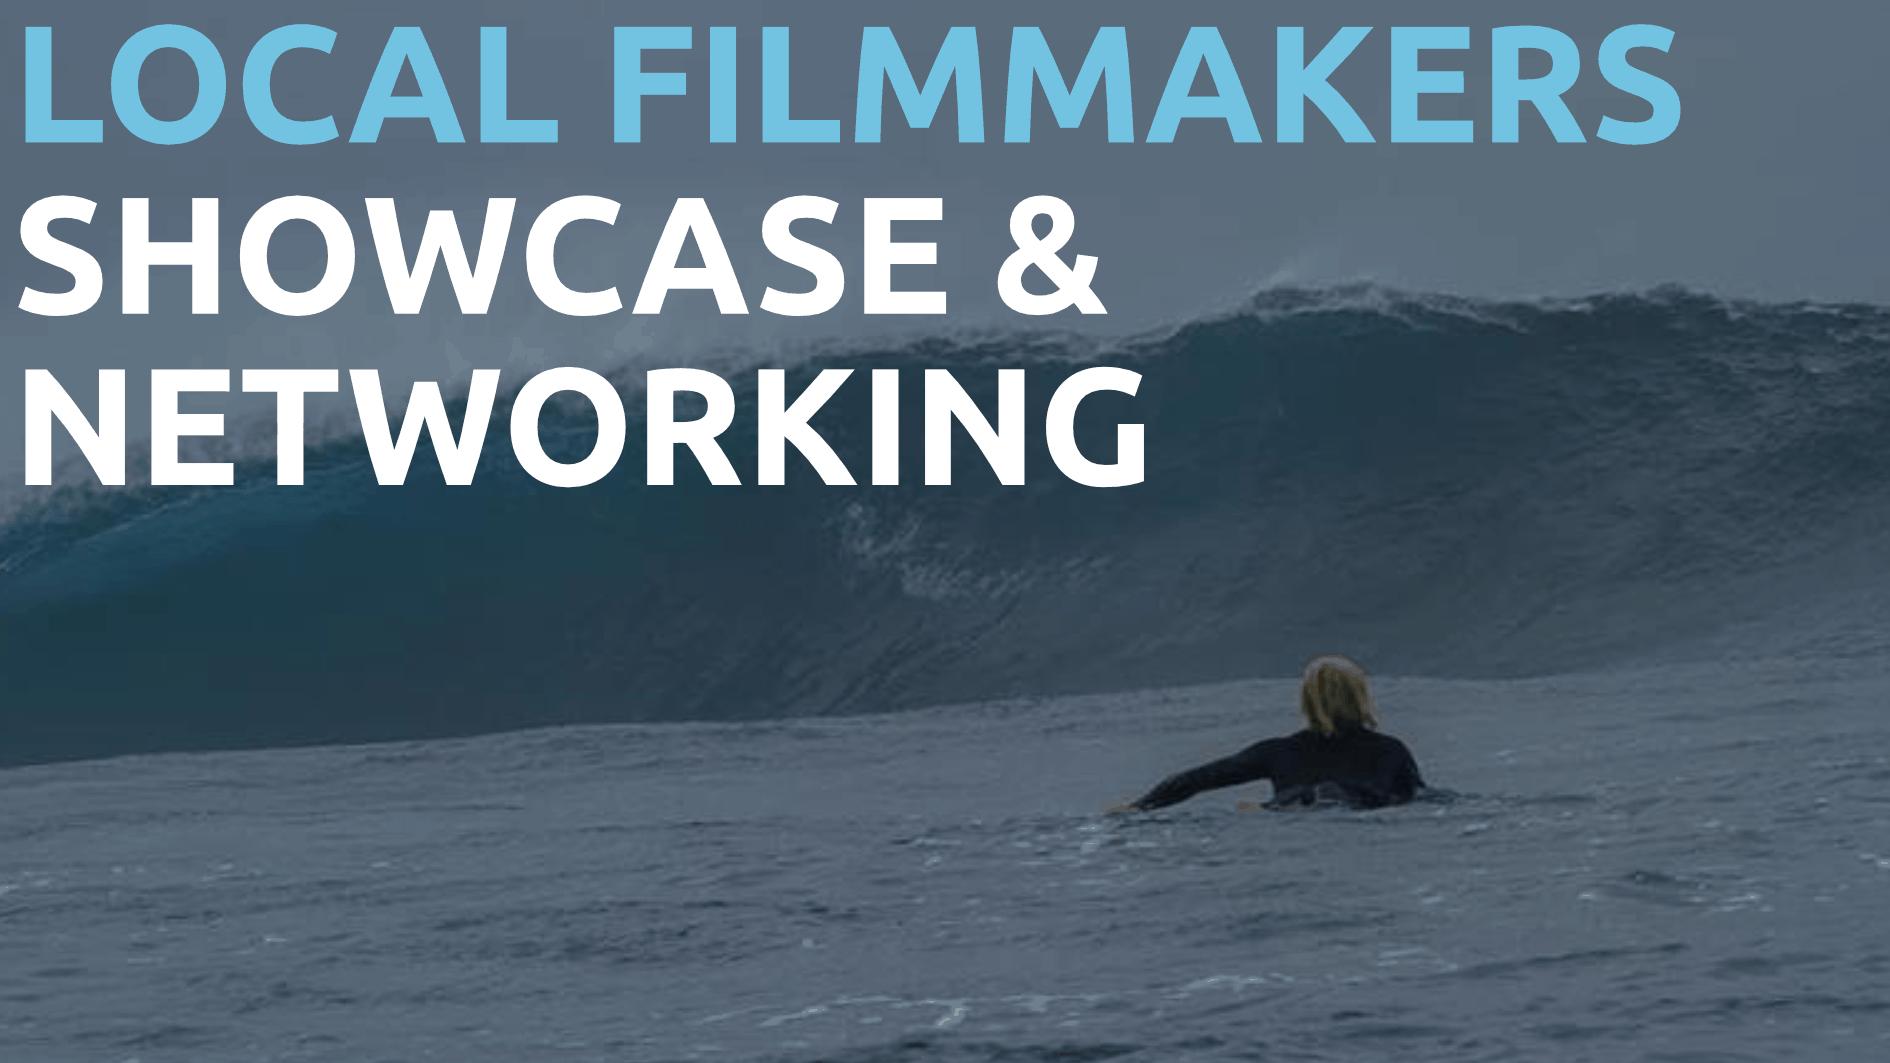 Sydney Lift-Off Film Festival 2018 - Local Filmmakers Showcase